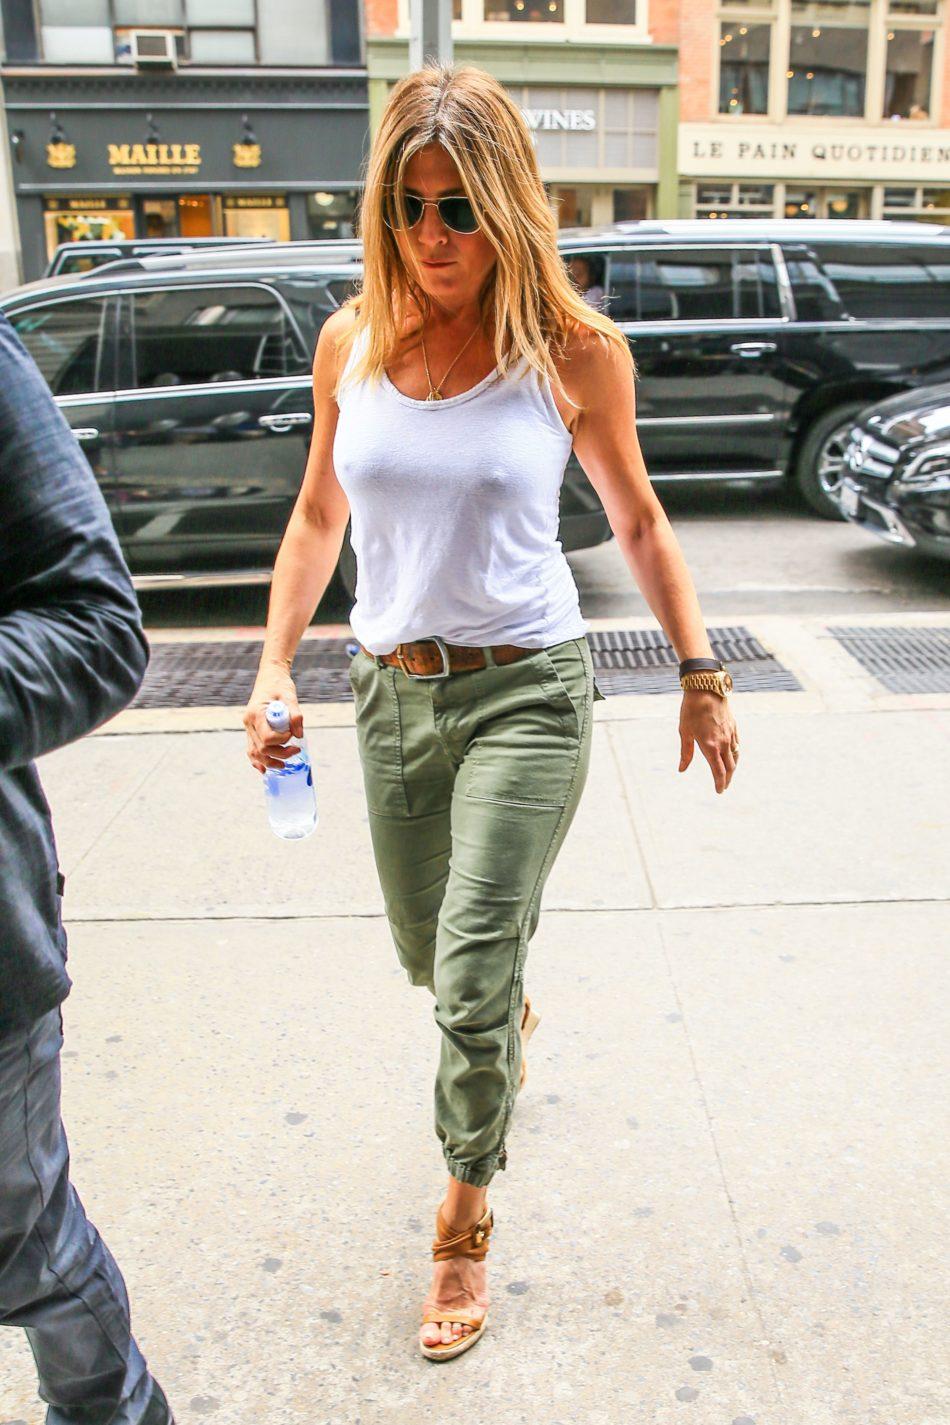 vídeo real Jennifer Aniston follando